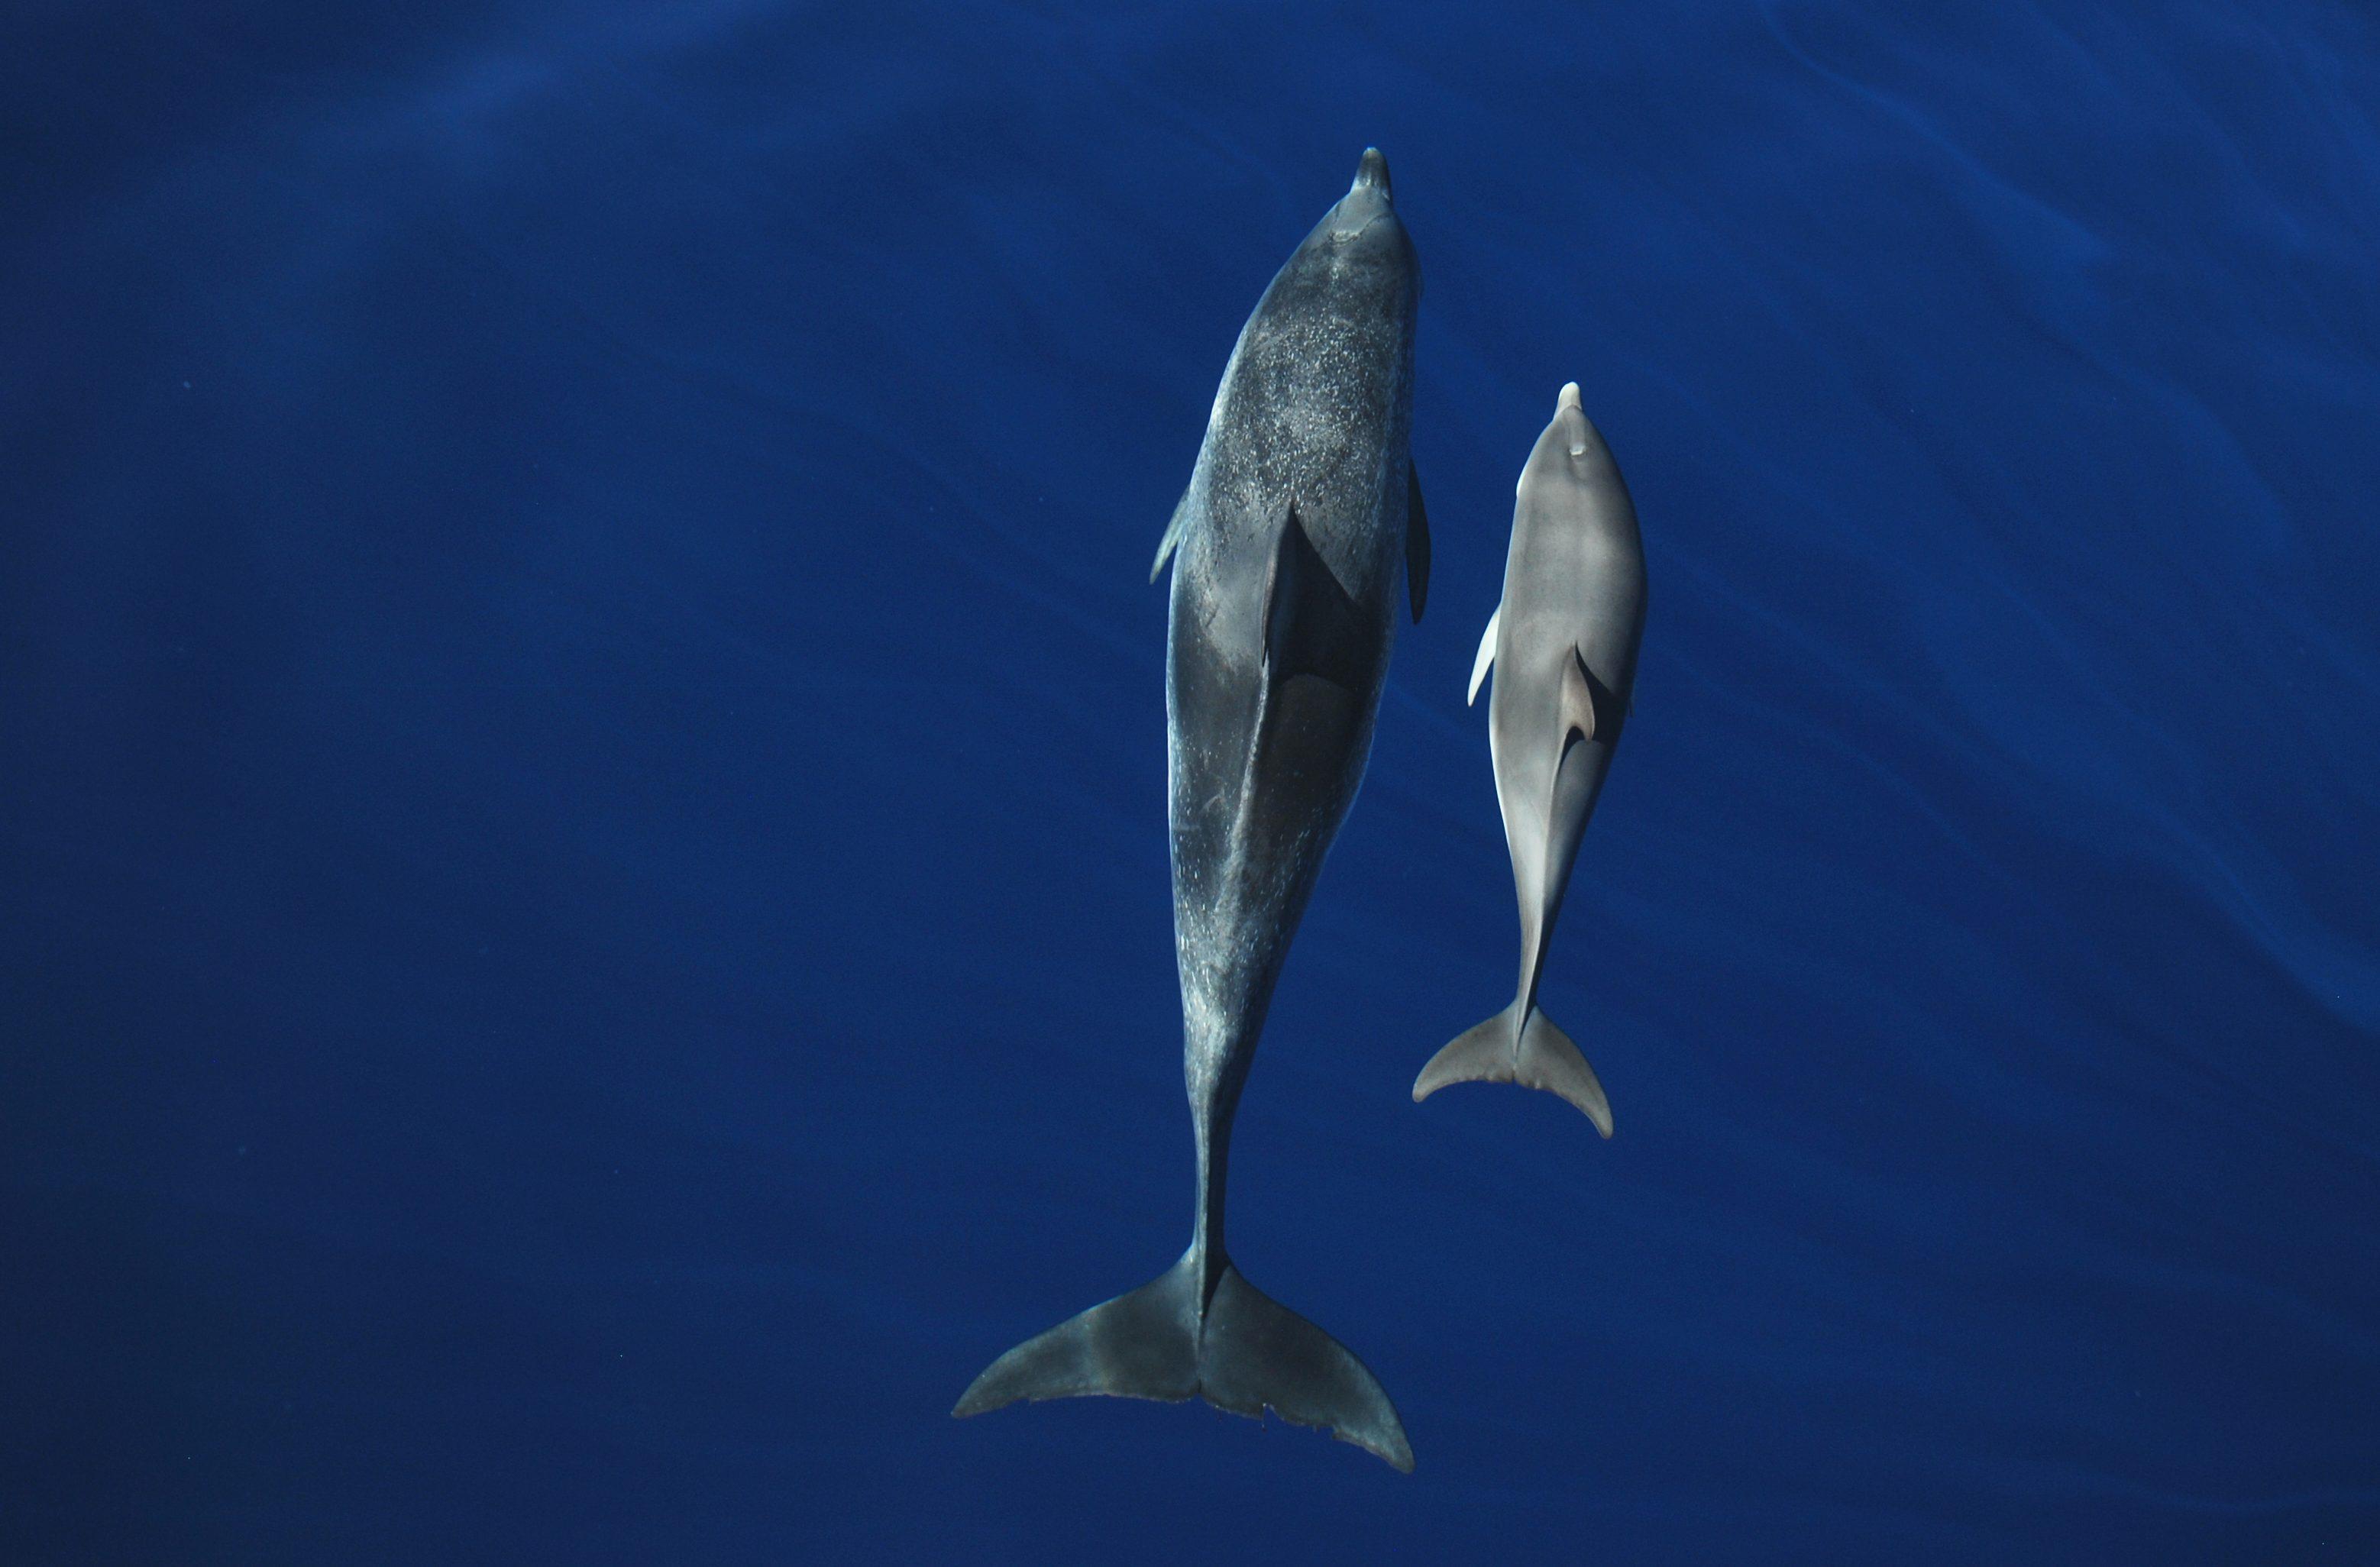 Atlantic-spotted-dolphins-Copyright-Miranda-van-der-Linde-6-e1486661546775